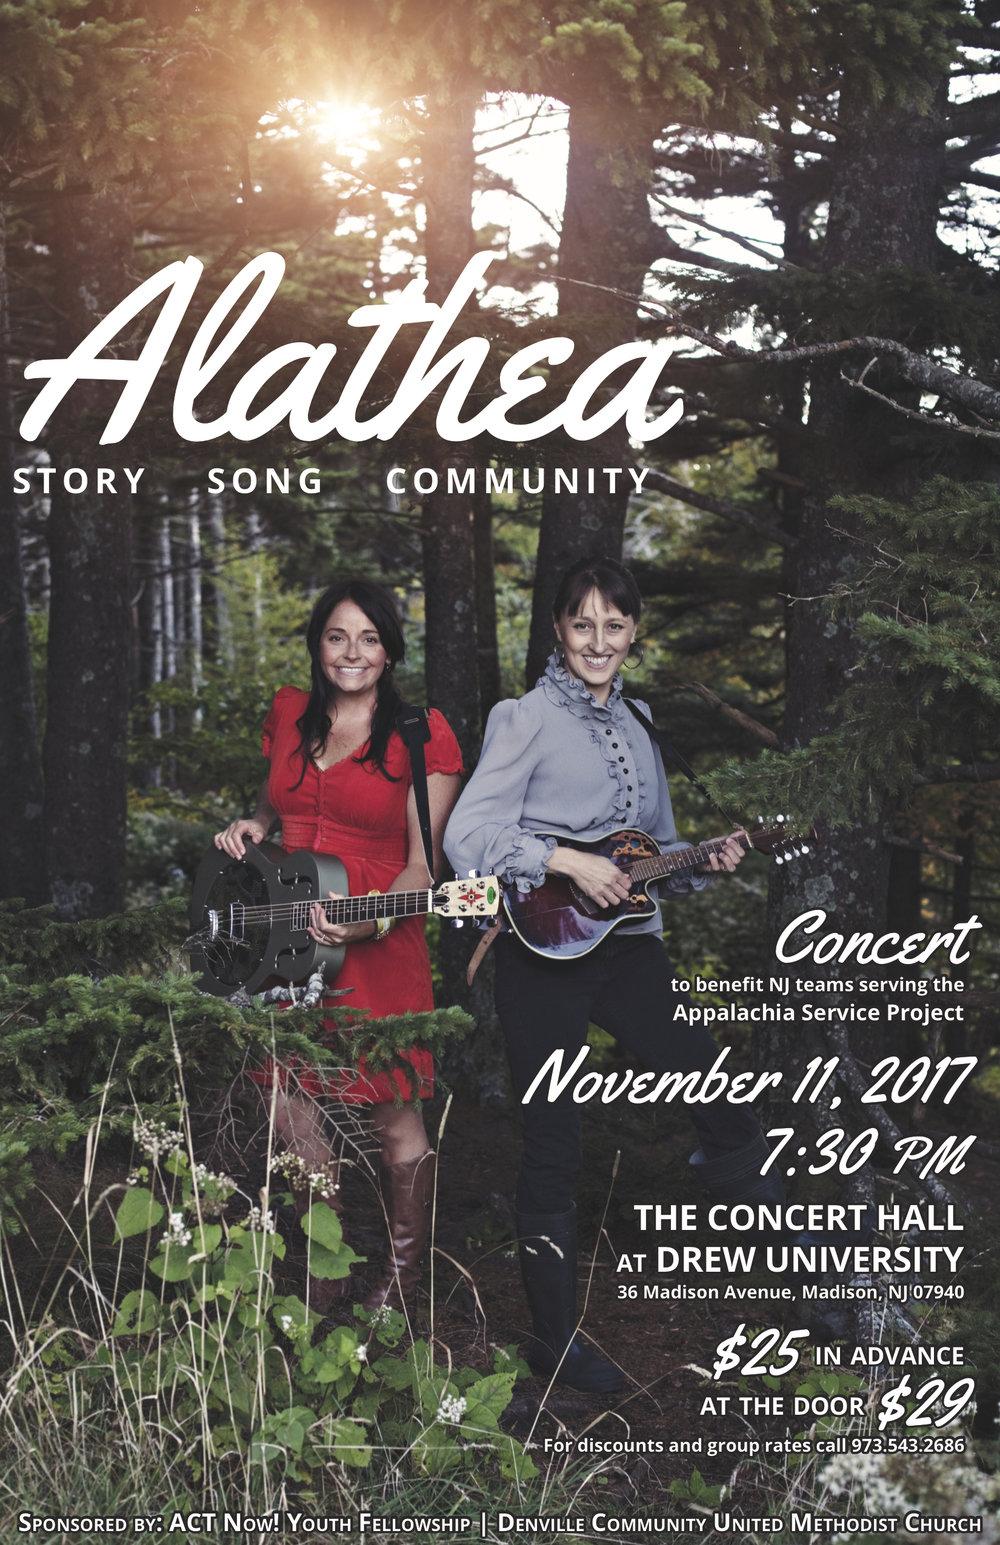 Acoustic Christmas 2019 Johnson City Tn.Alathea Tour Dates Alathea